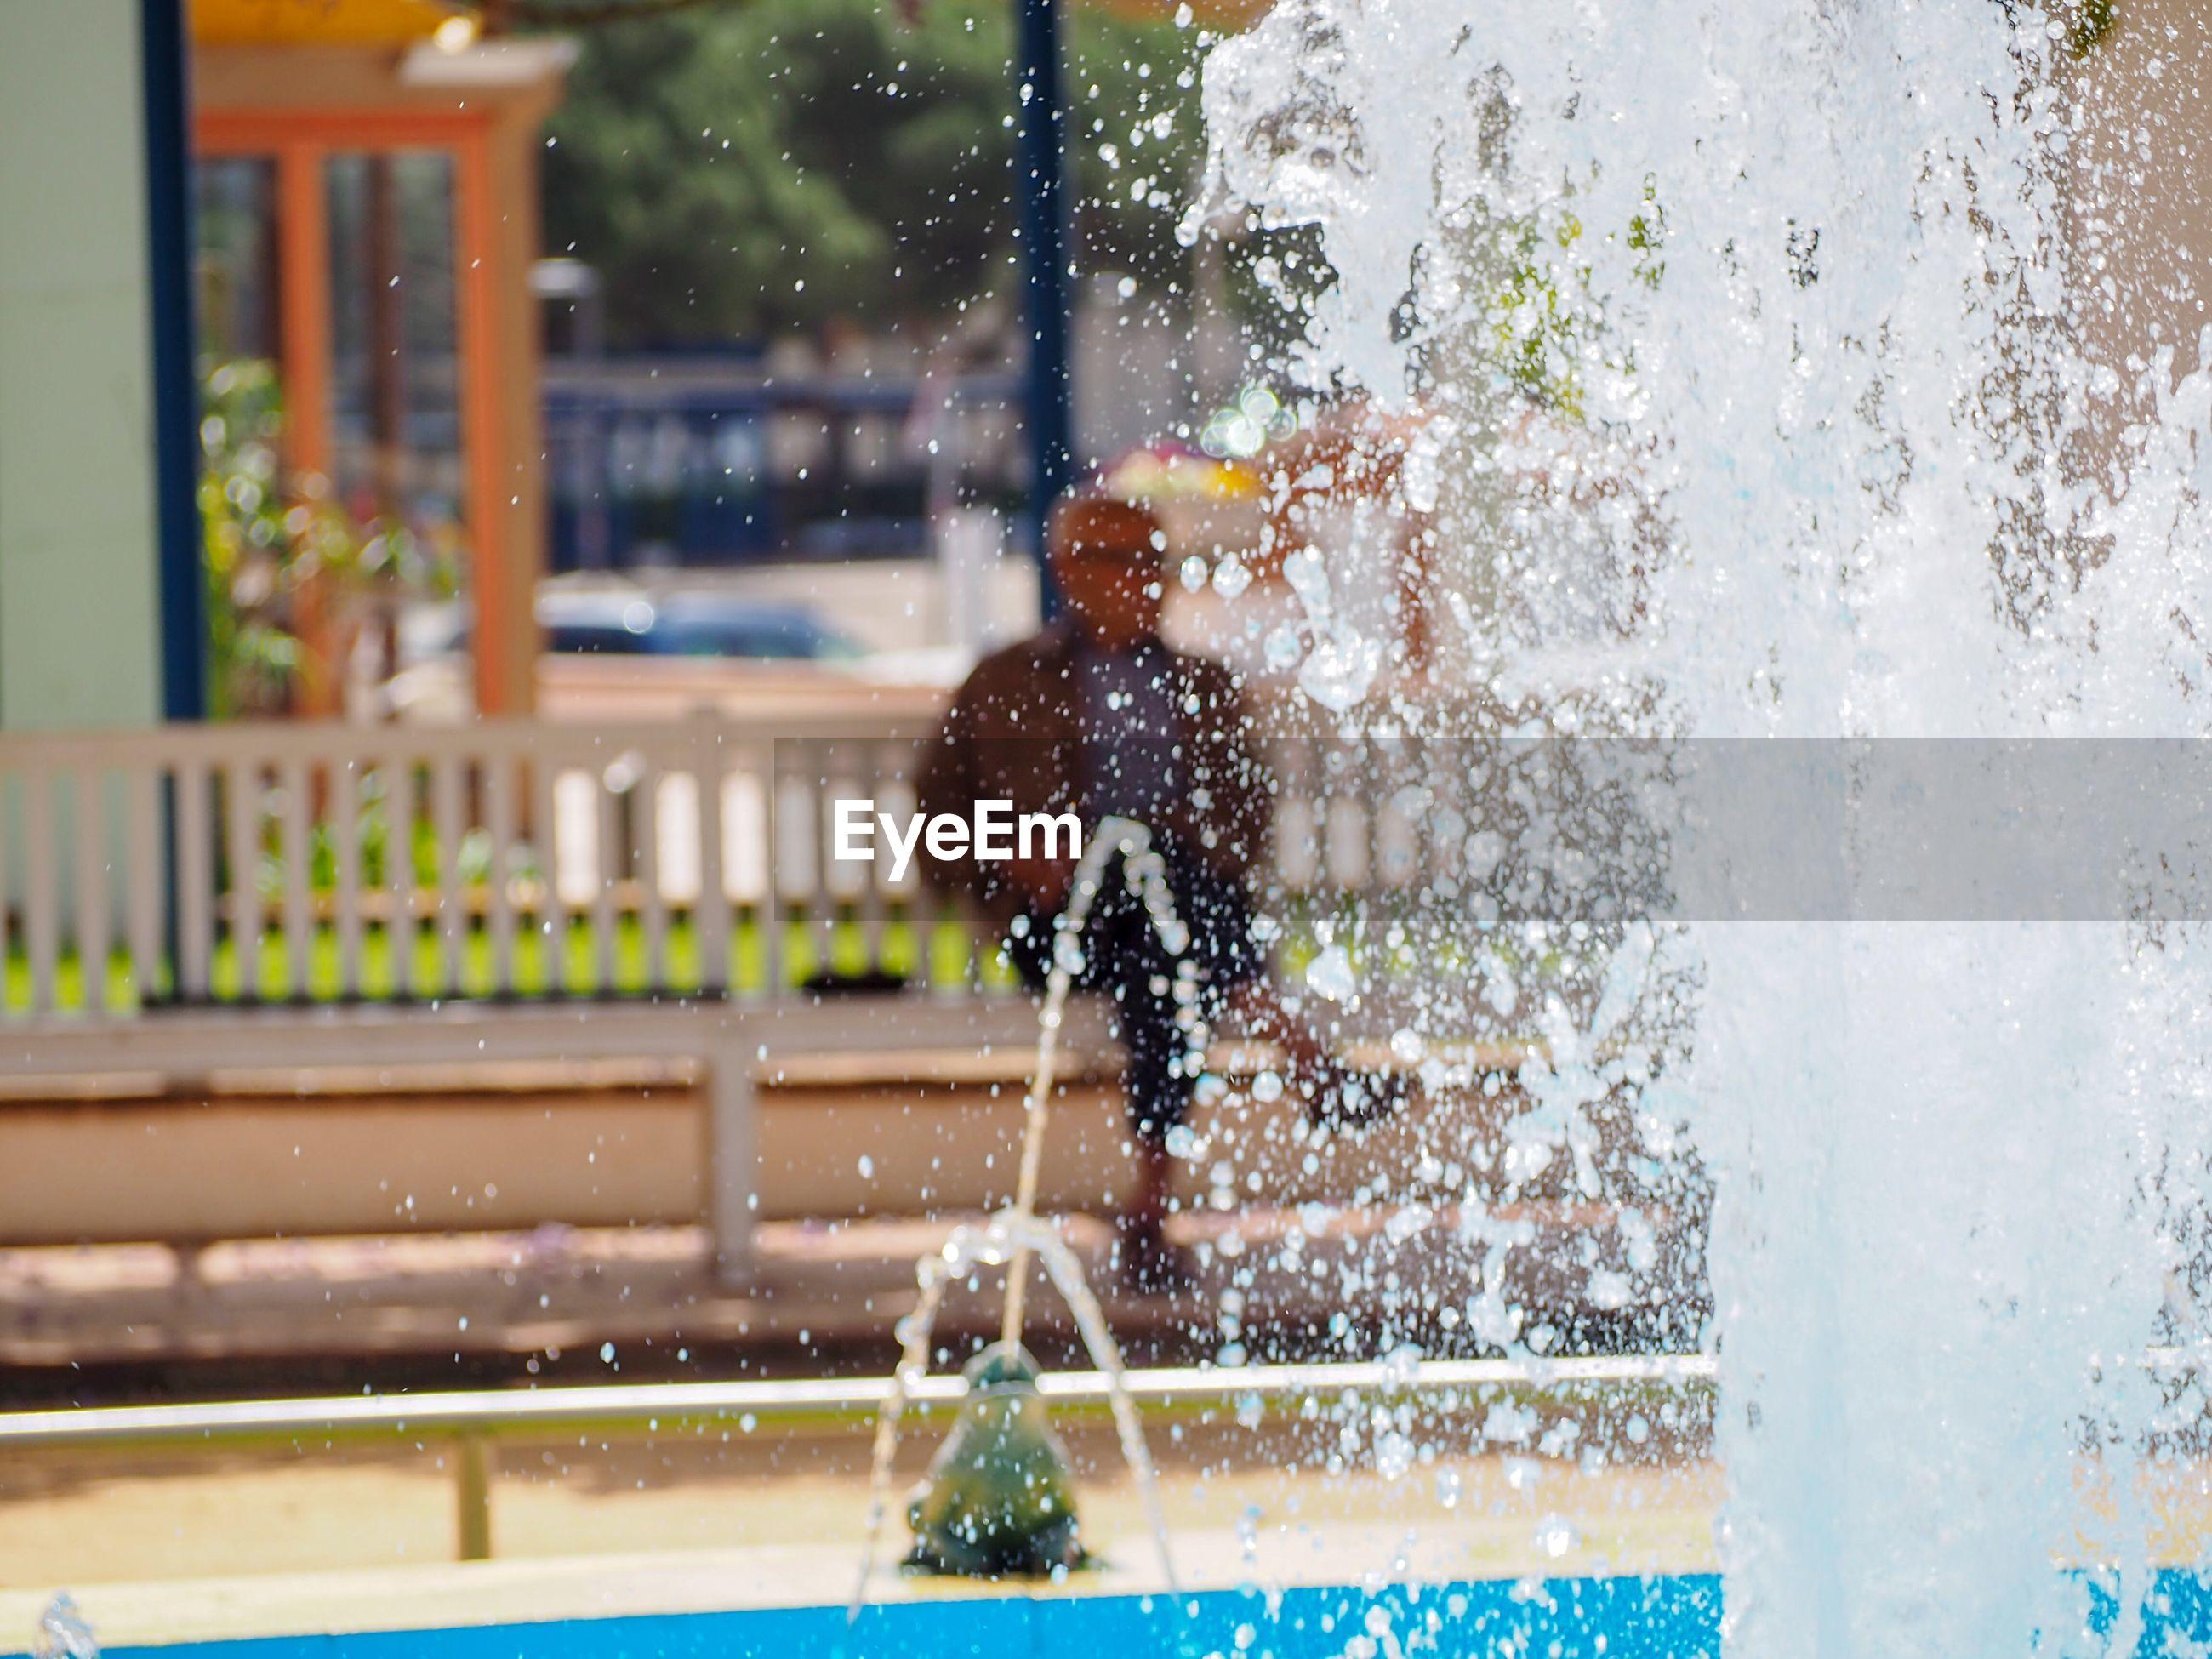 MAN SPLASHING WATER IN FOUNTAIN